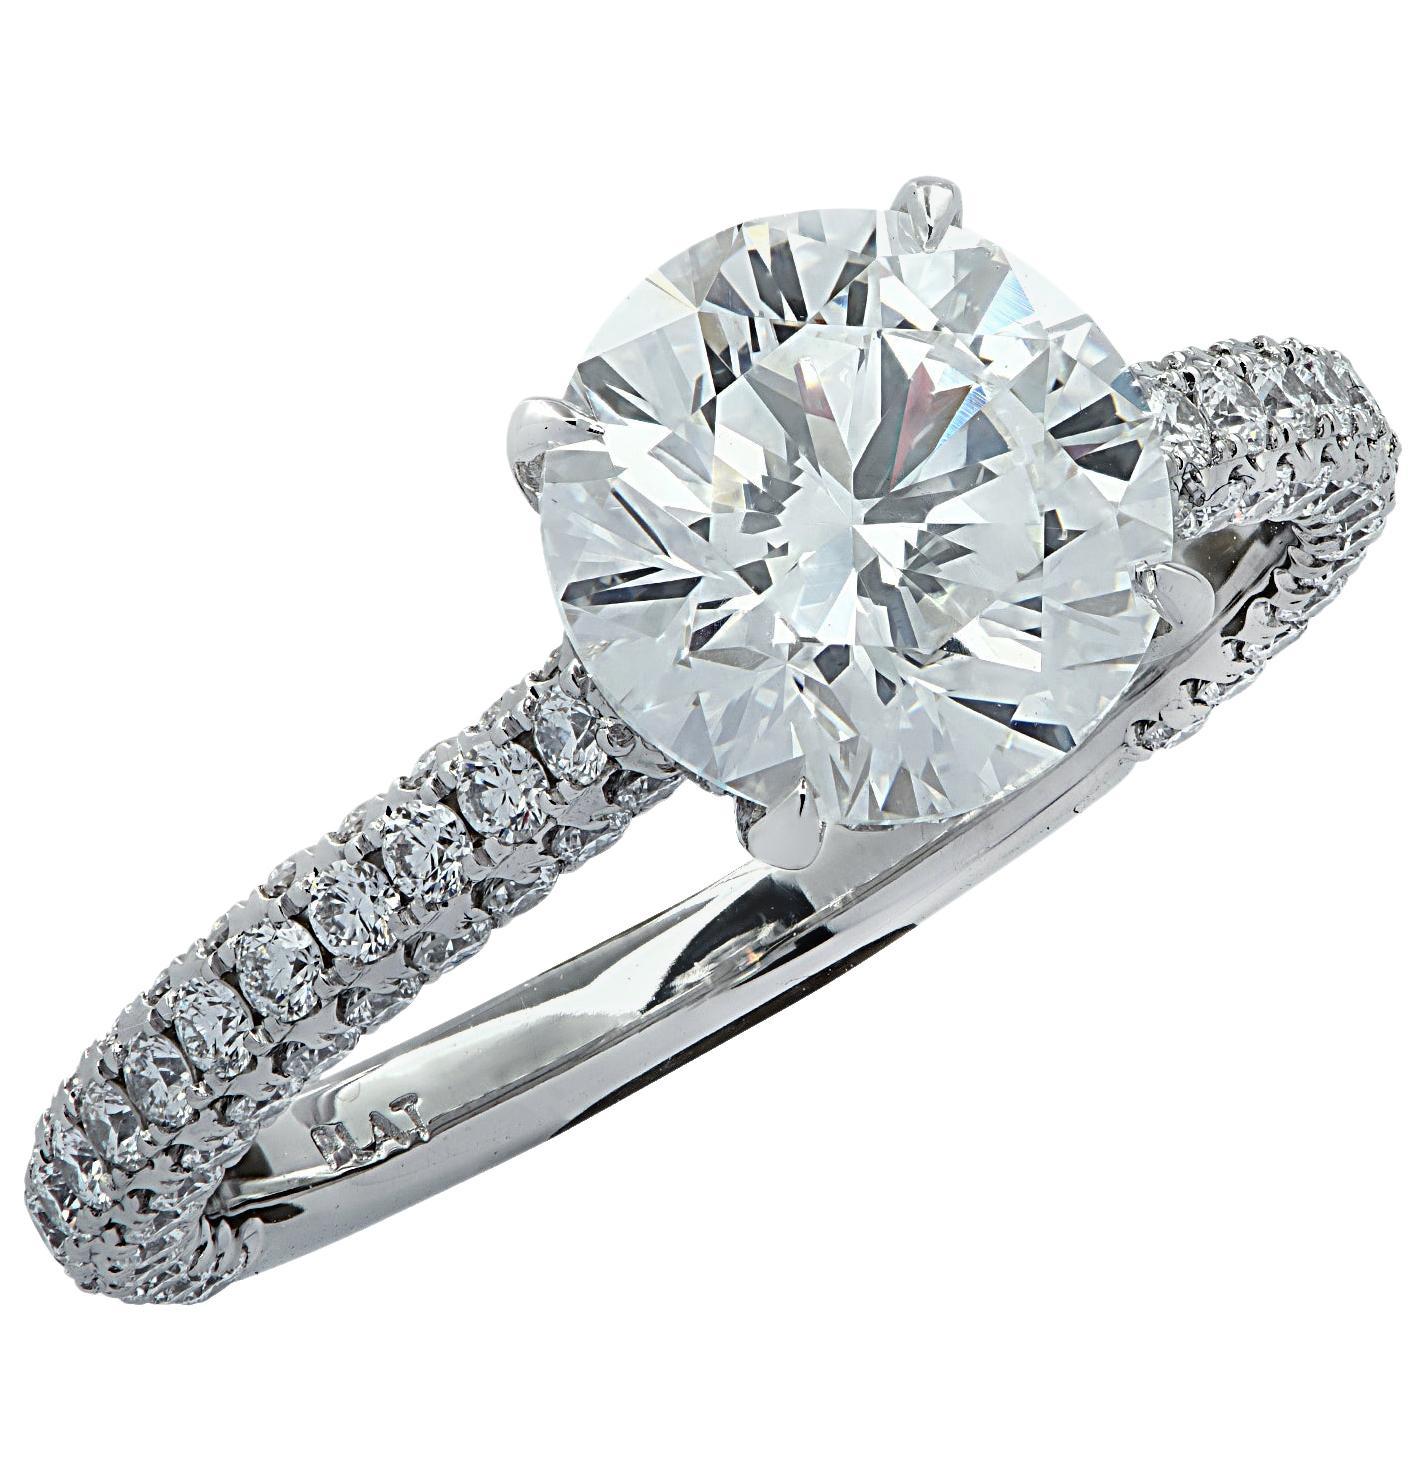 Vivid Diamonds GIA Certified 2.01 Carat Diamond Engagement Ring